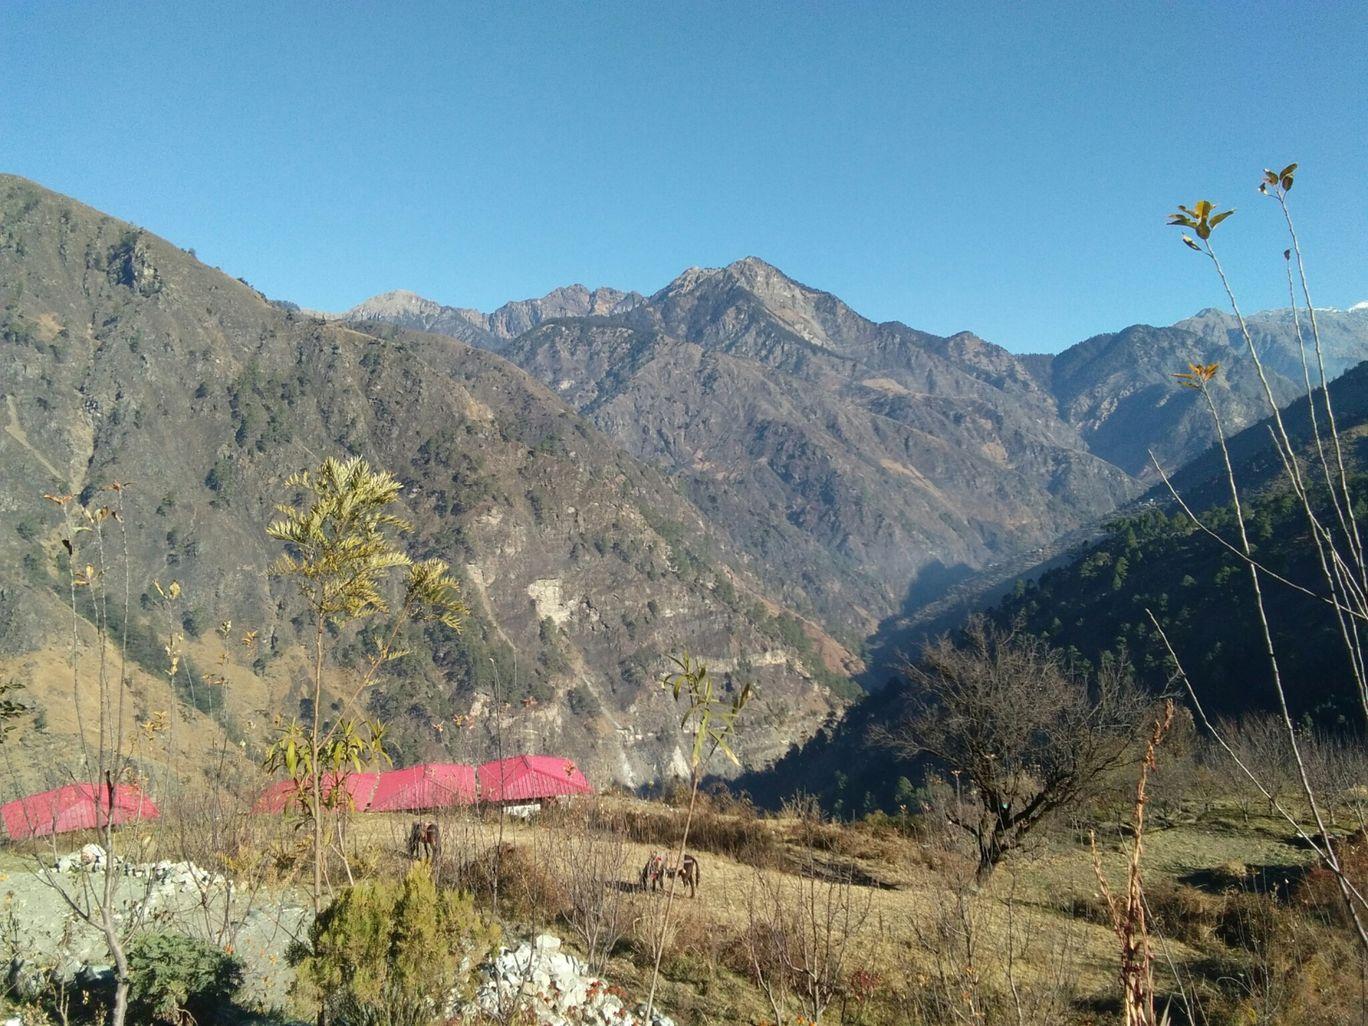 Photo of Kedarkantha Peak By Bharath G